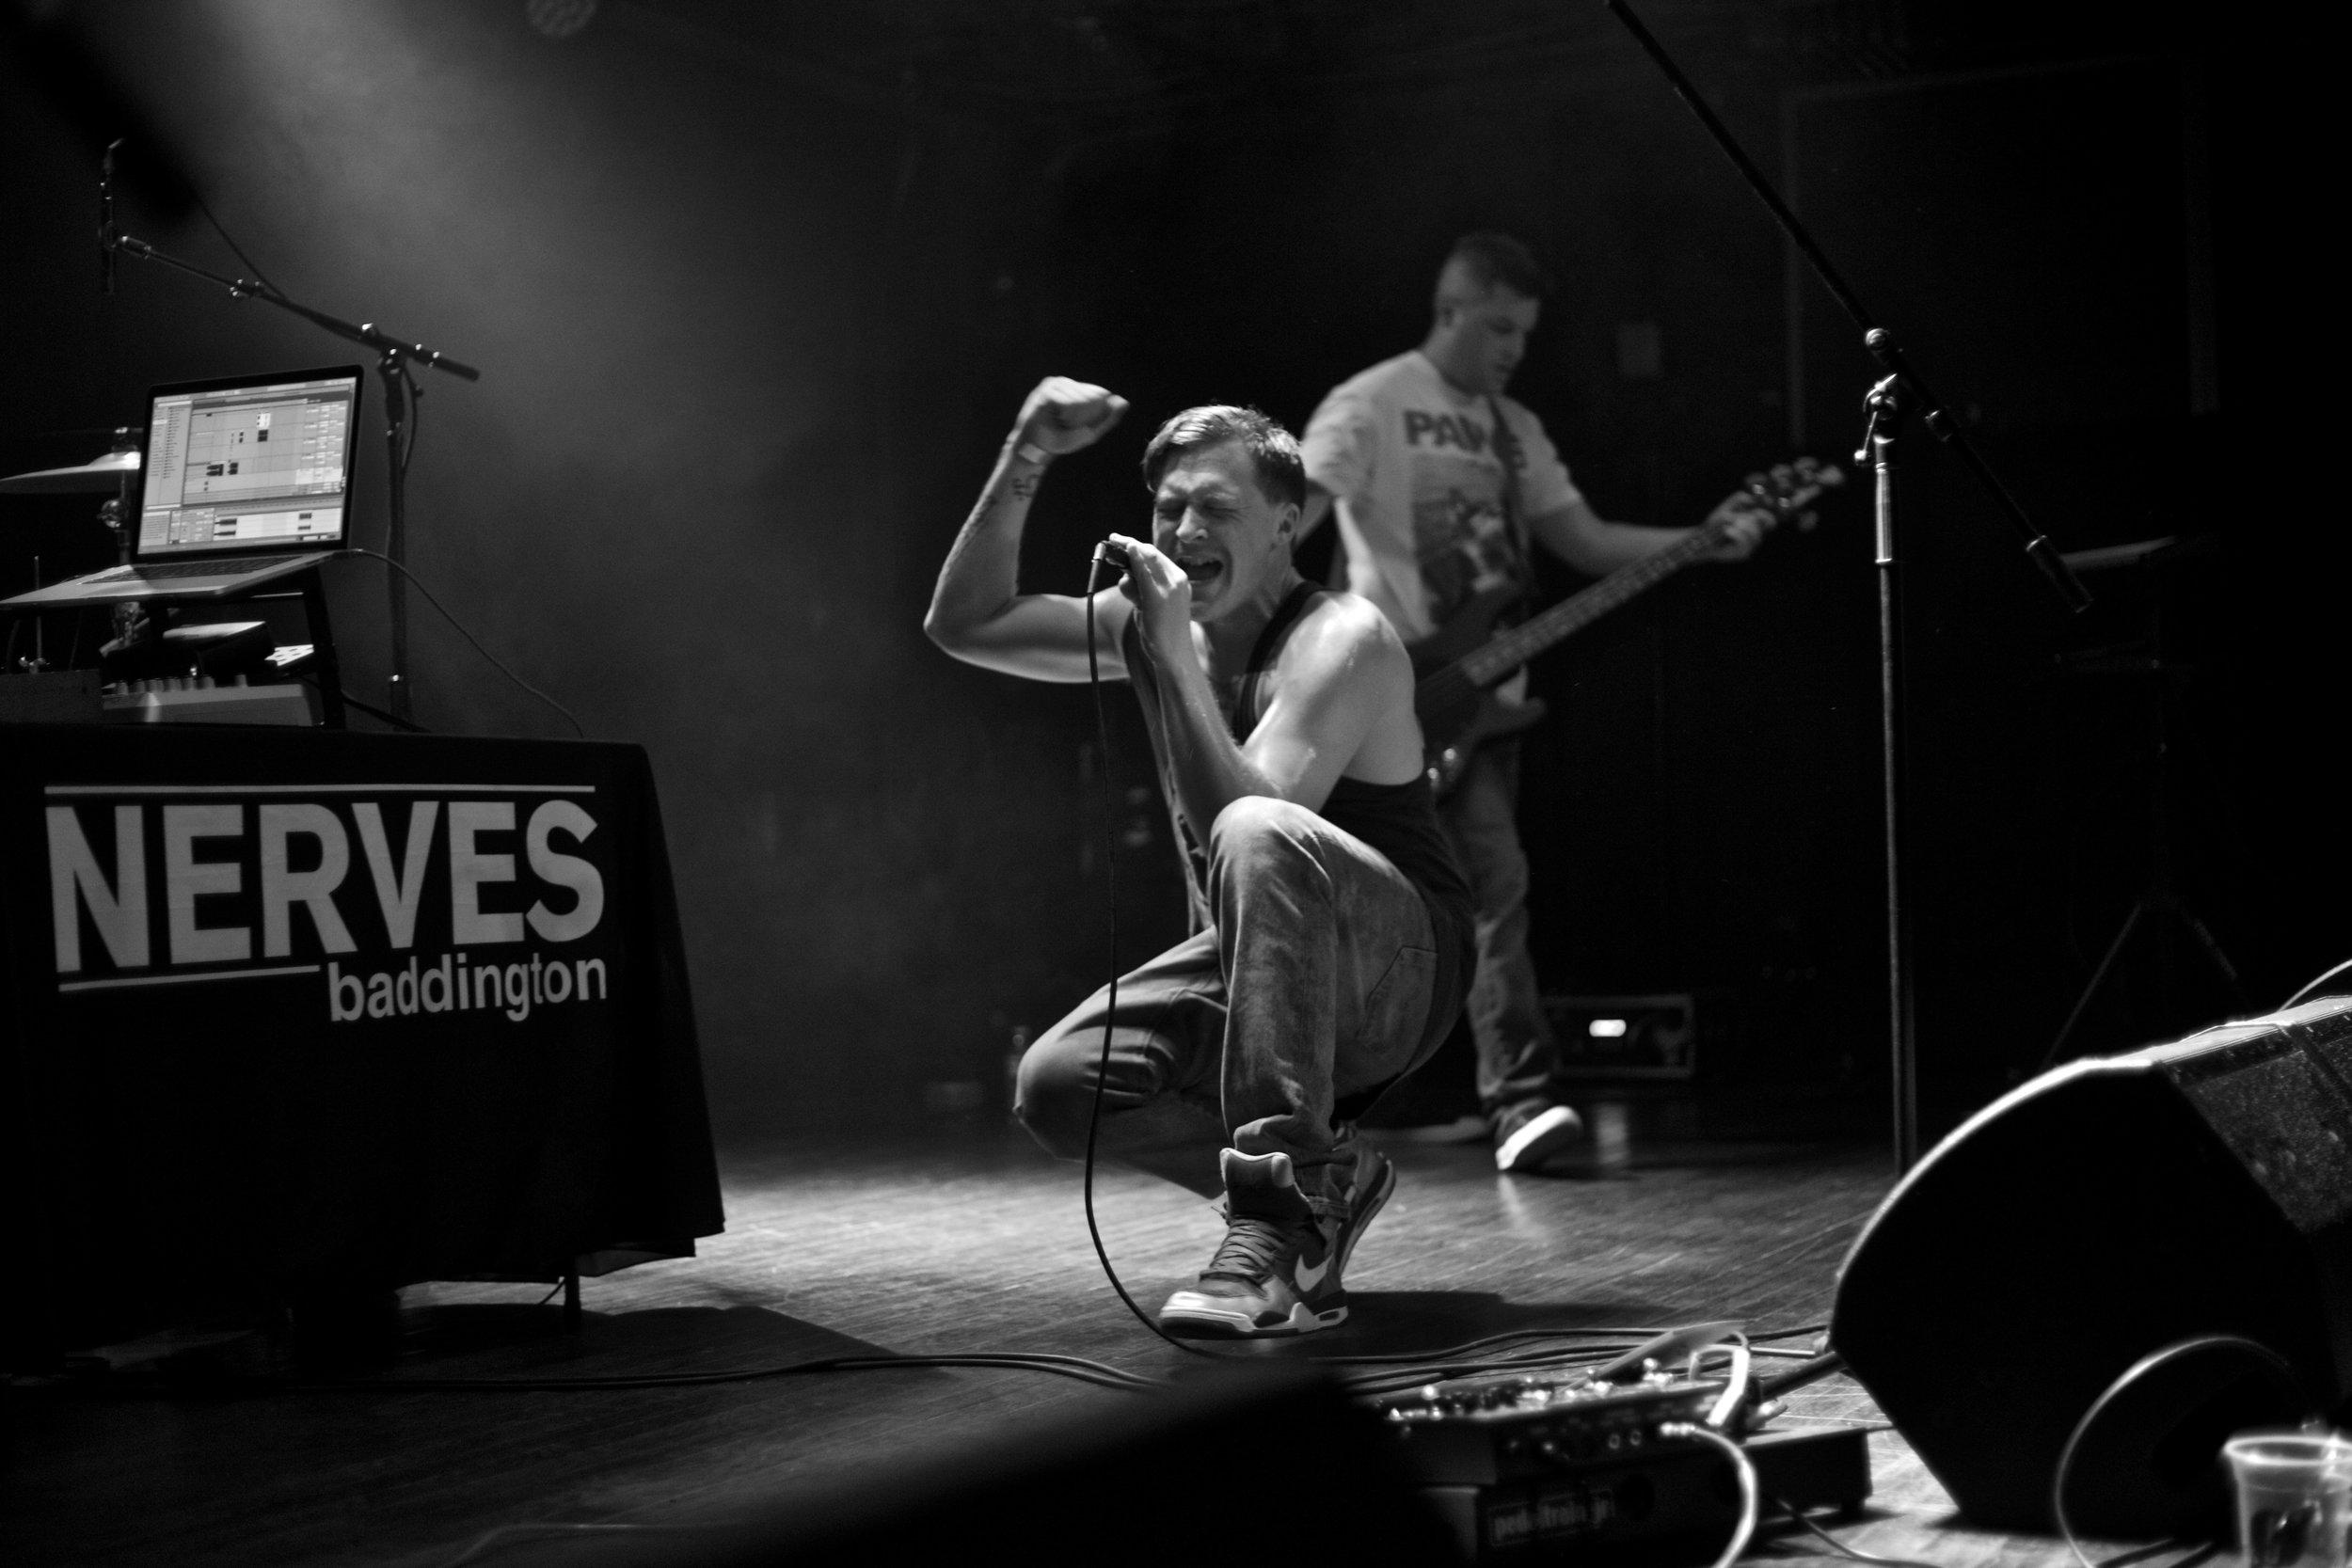 Nerves Baddington. Saturn. Birmingham, AL. 2016.